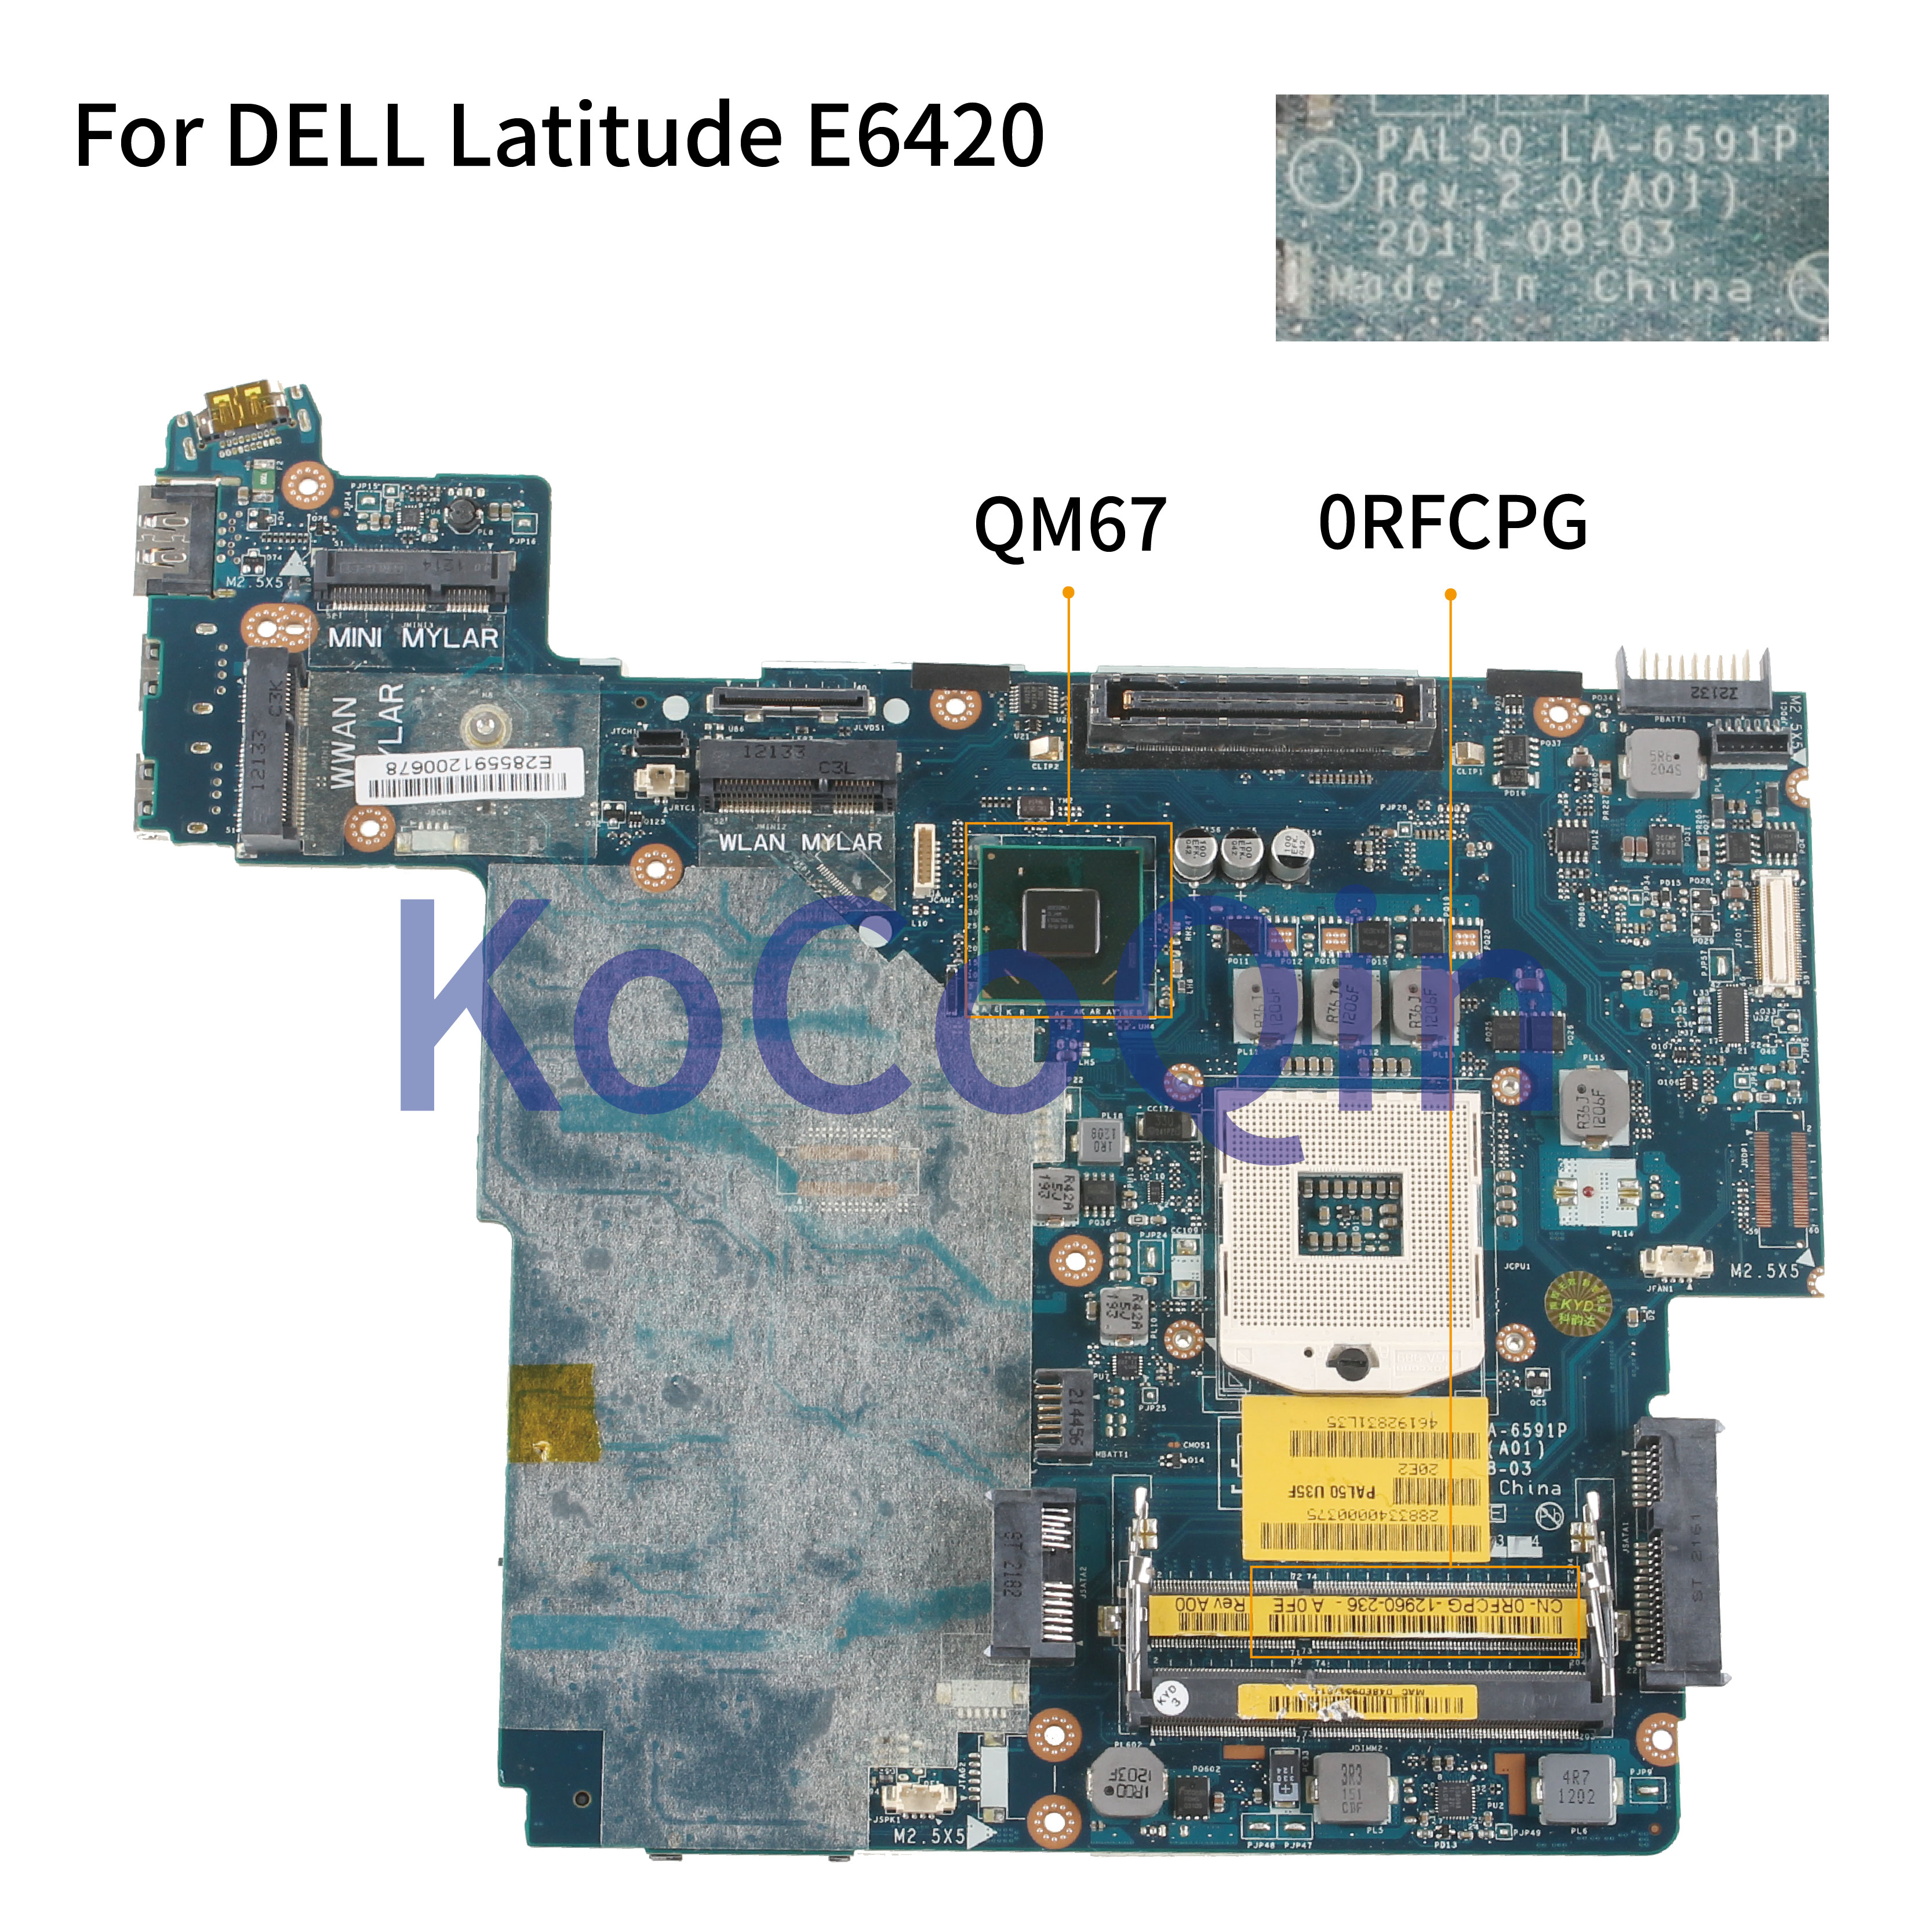 KoCoQin Laptop motherboard For DELL Latitude E6420 Mainboard PAL50 LA 6591P CN 0RFCPG 0RFCPG QM67 Laptop Motherboard     - title=